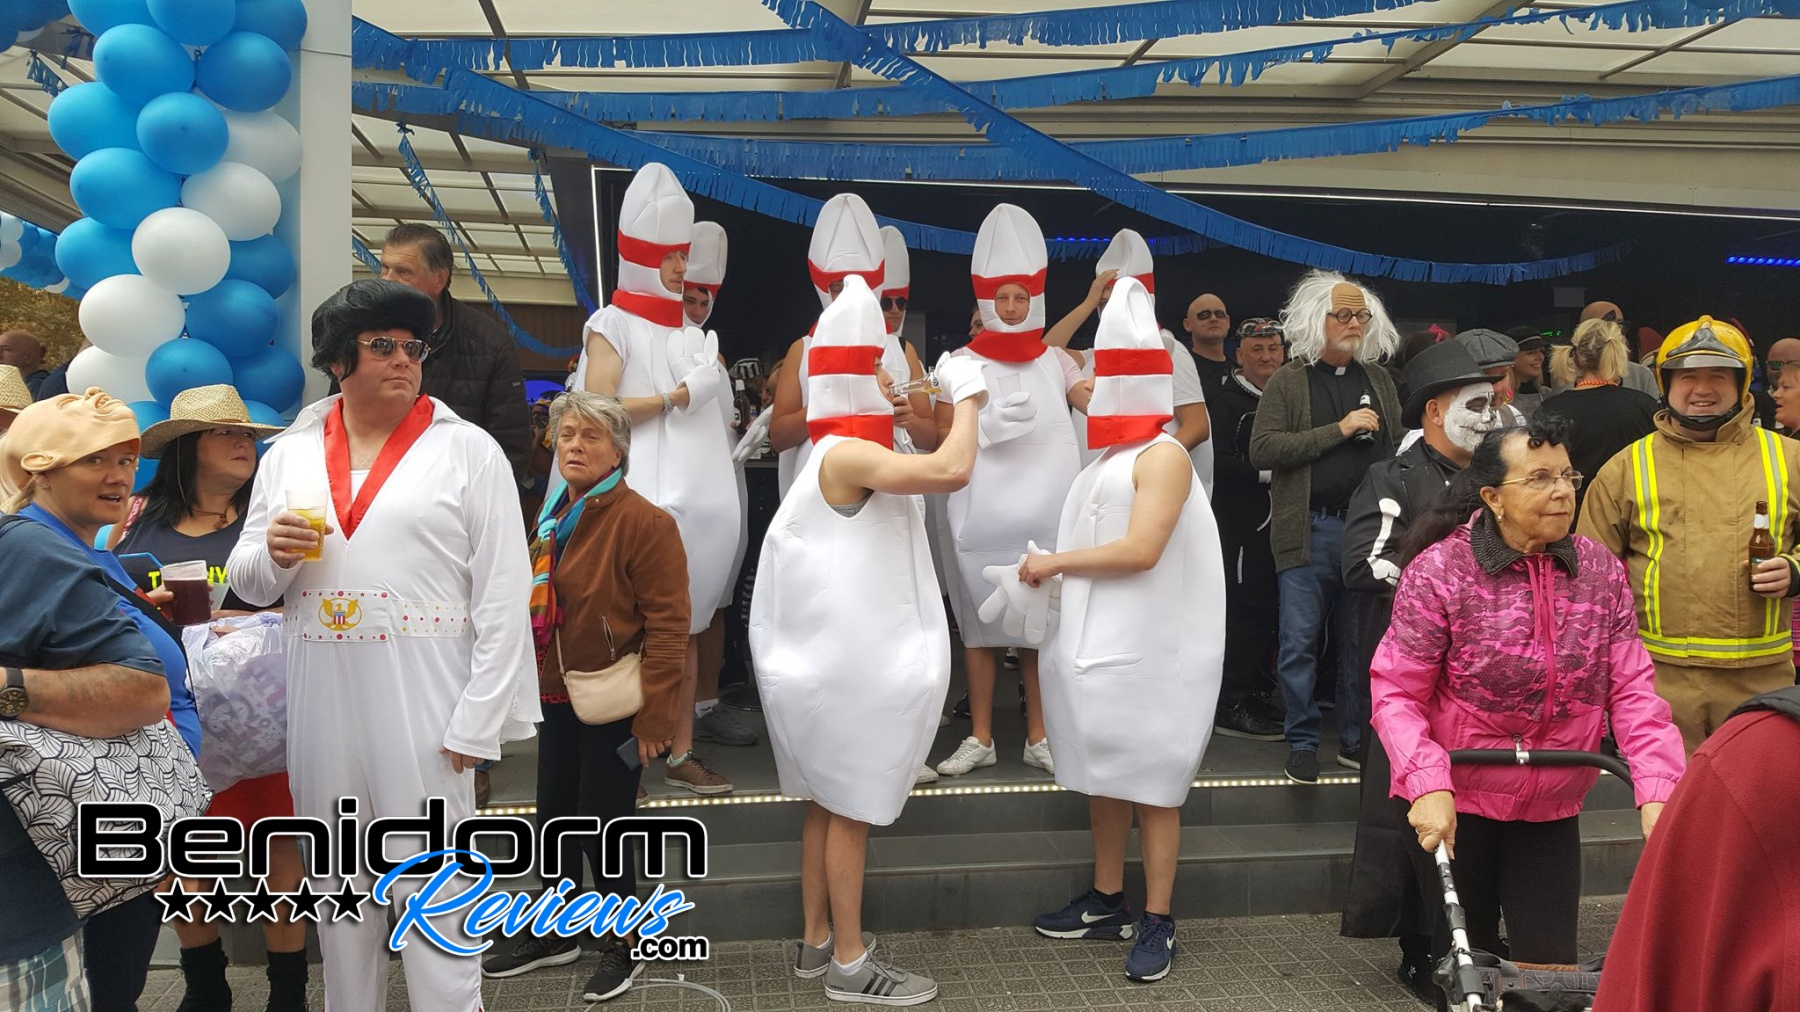 Benidorm-Fiestas-2019-Fancy-Dress-100